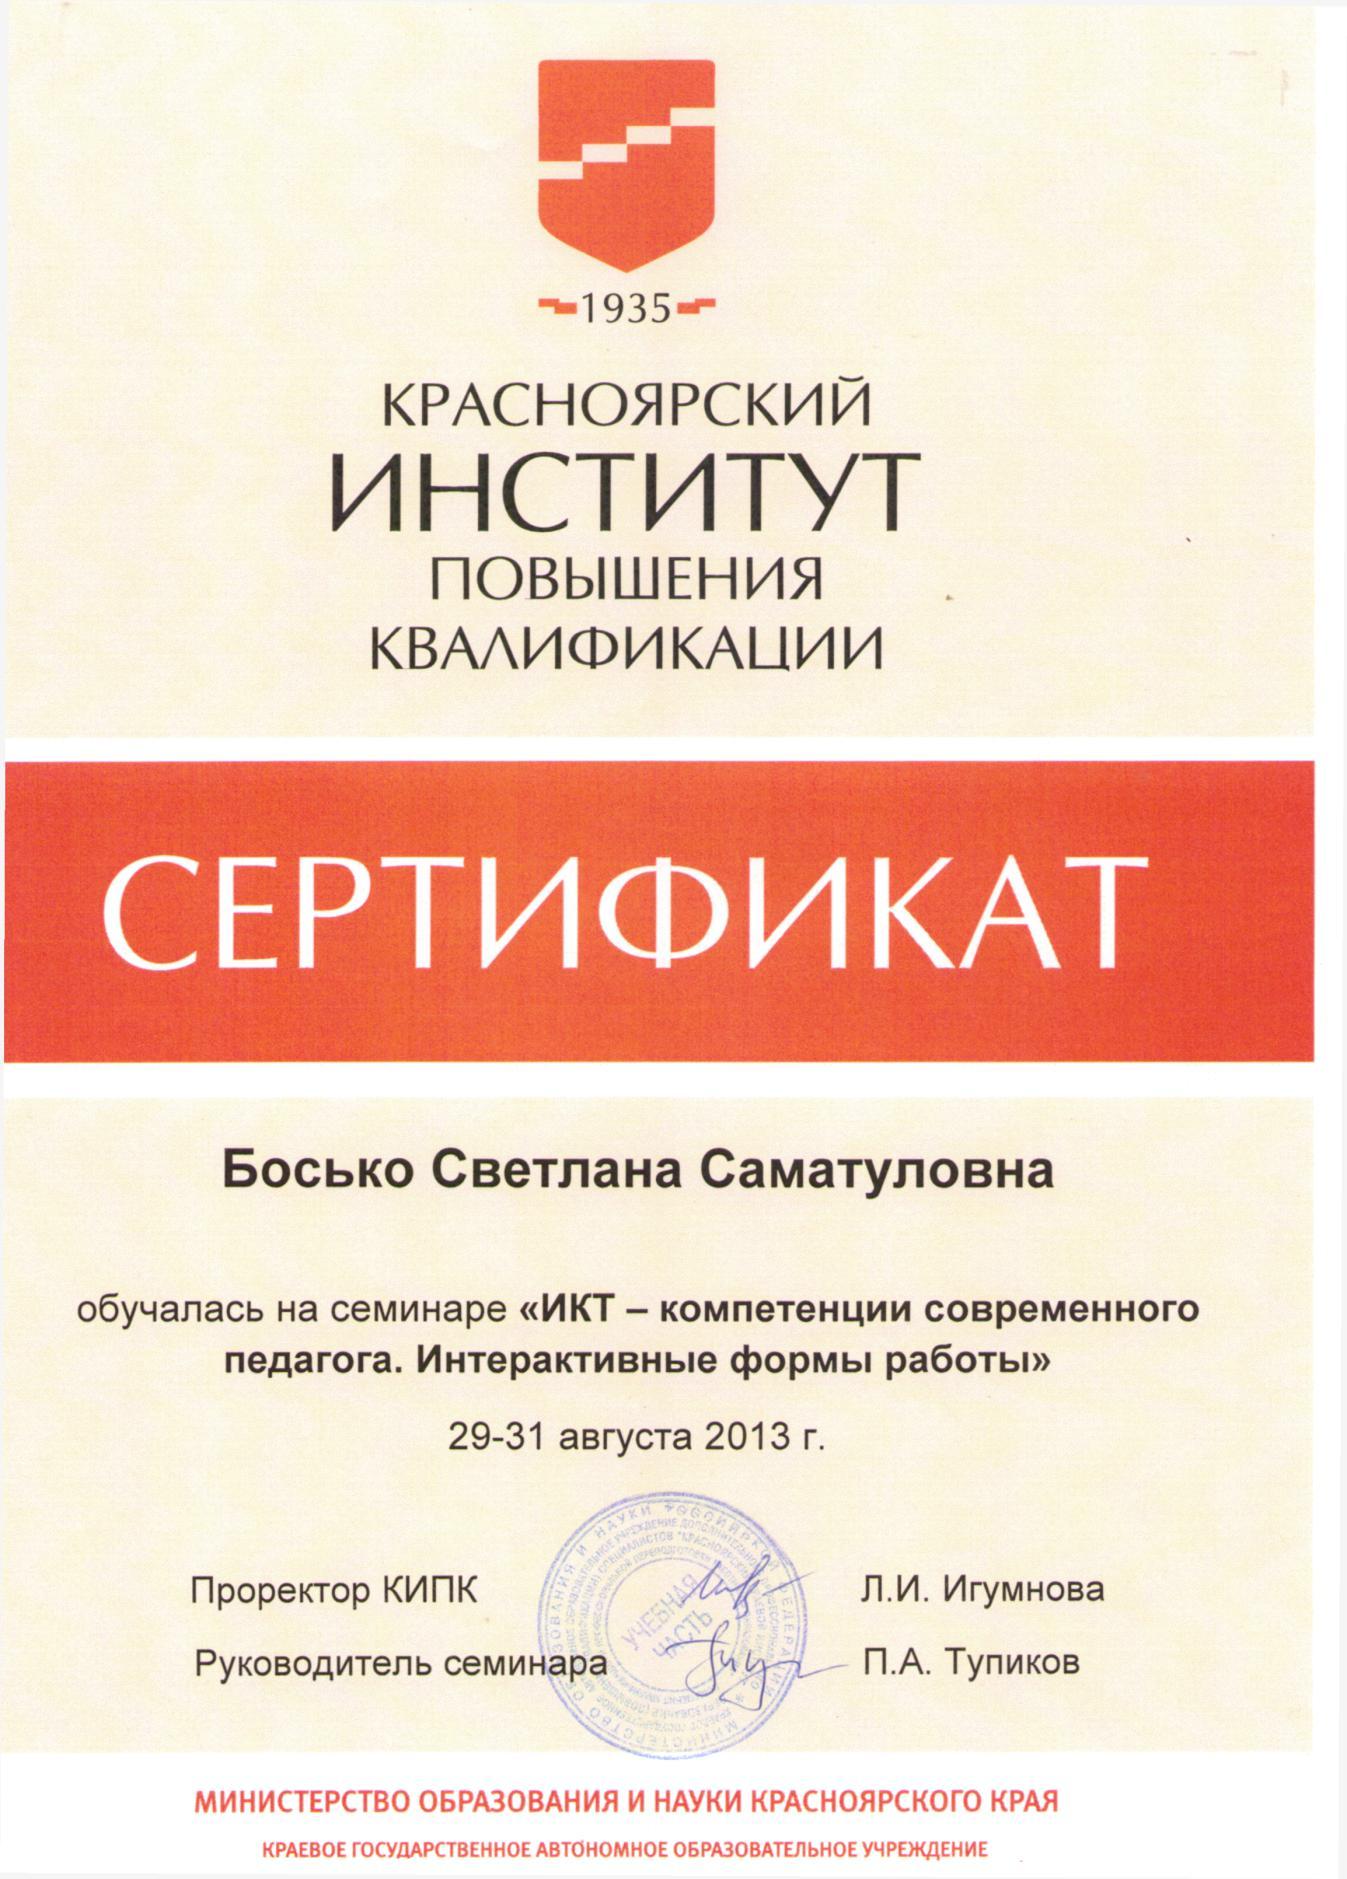 C:\Documents and Settings\Светлана Саматуловна\Рабочий стол\квалификация\13 сертиф.tif